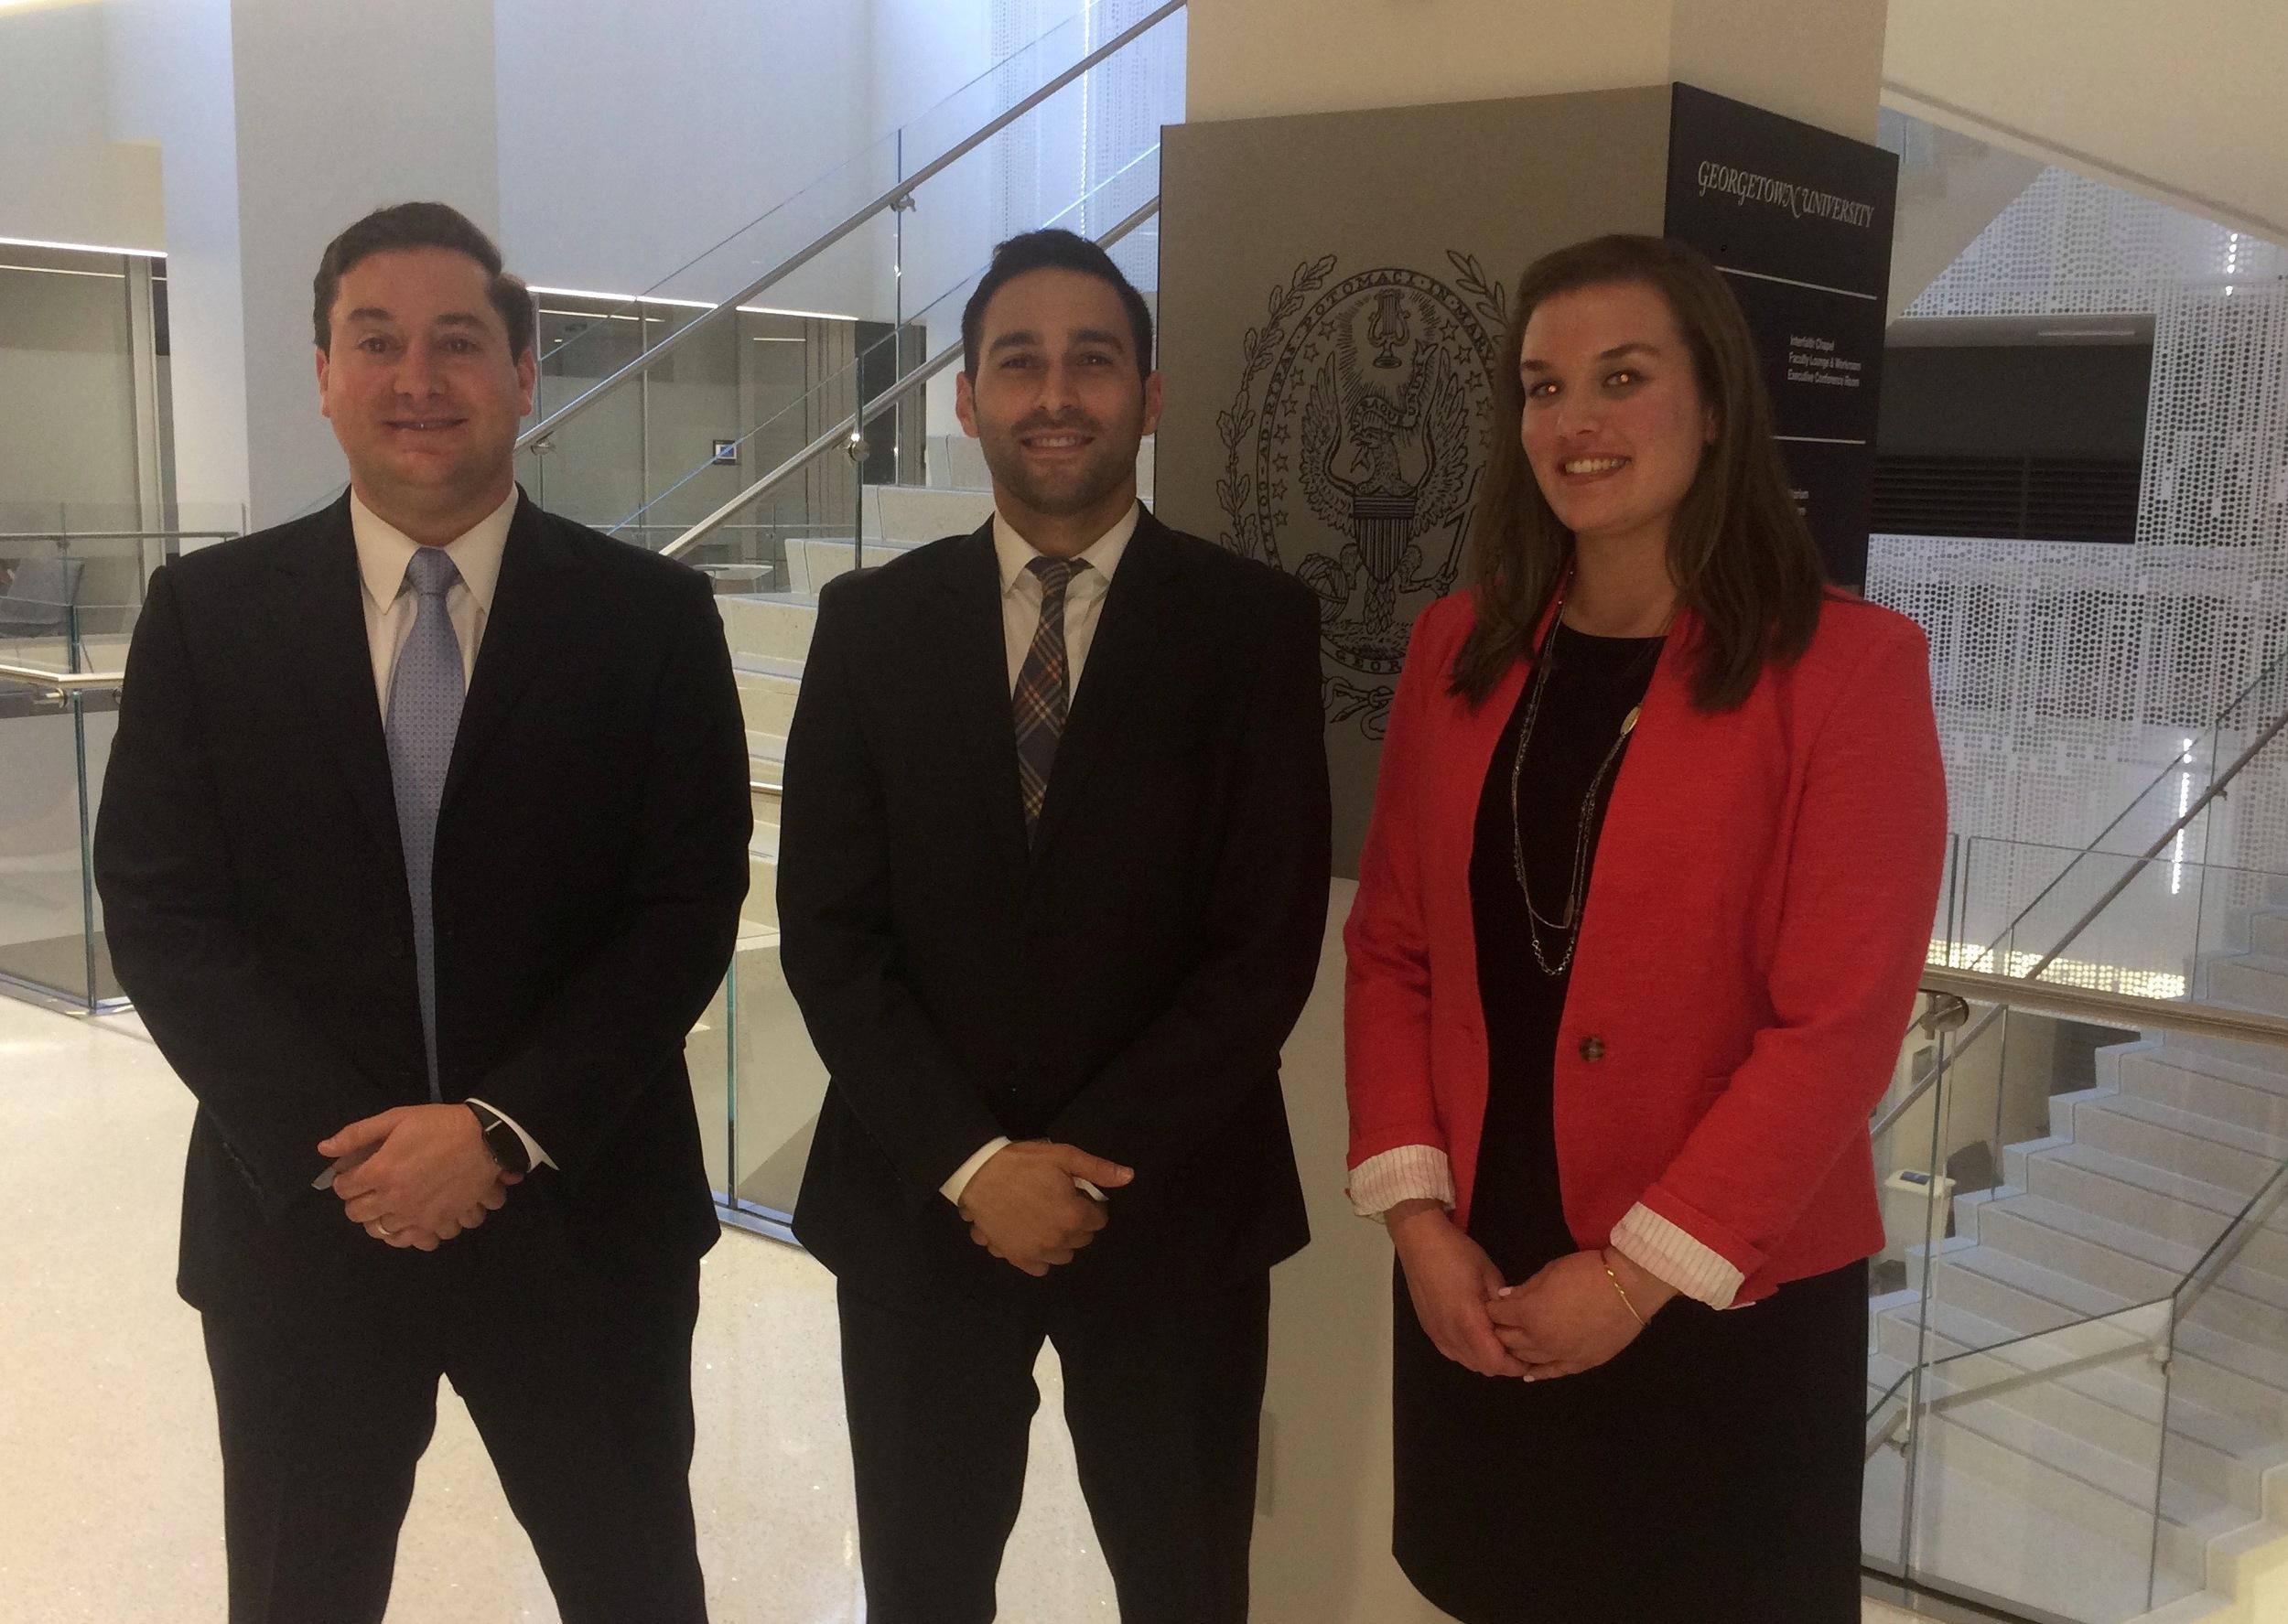 From Left: Eric Kasenetz, Omar Samaha, and Nicole Robertson